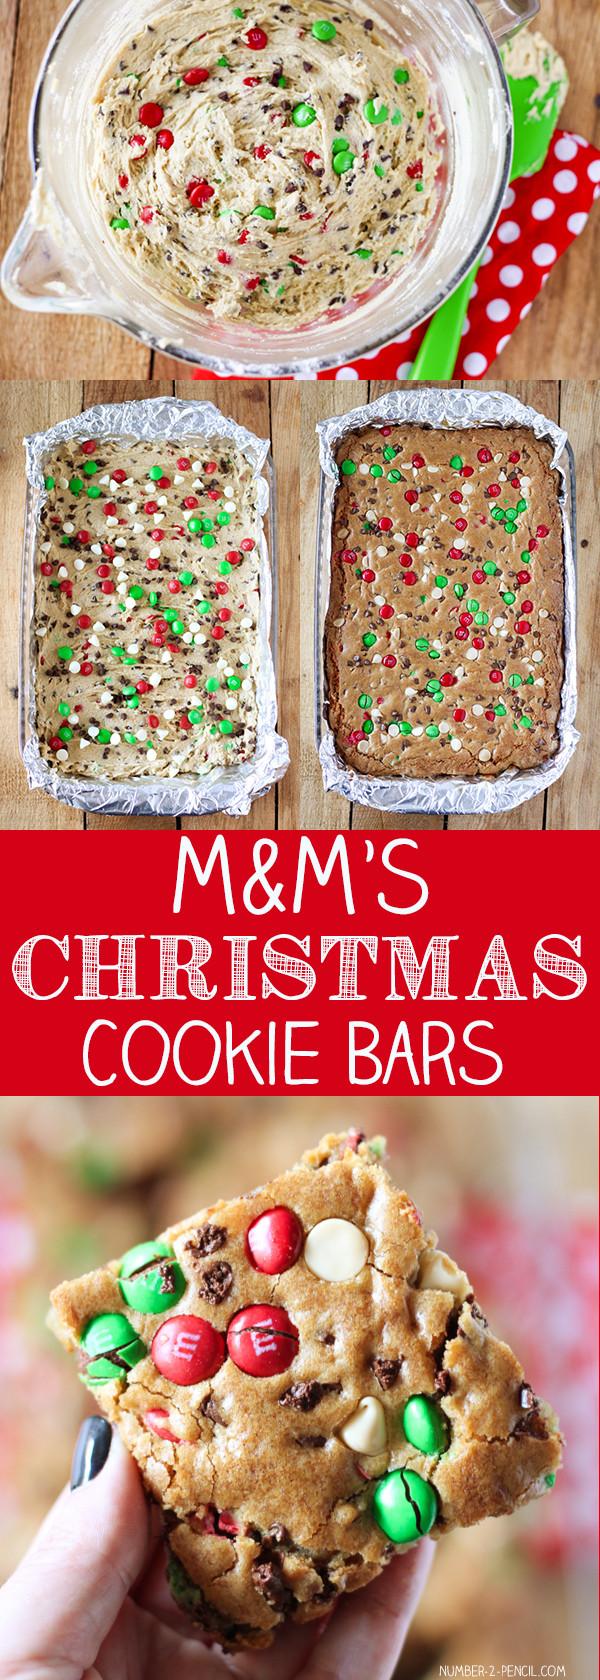 Christmas Cookies Bar  M&M S Christmas Cookie Bars No 2 Pencil